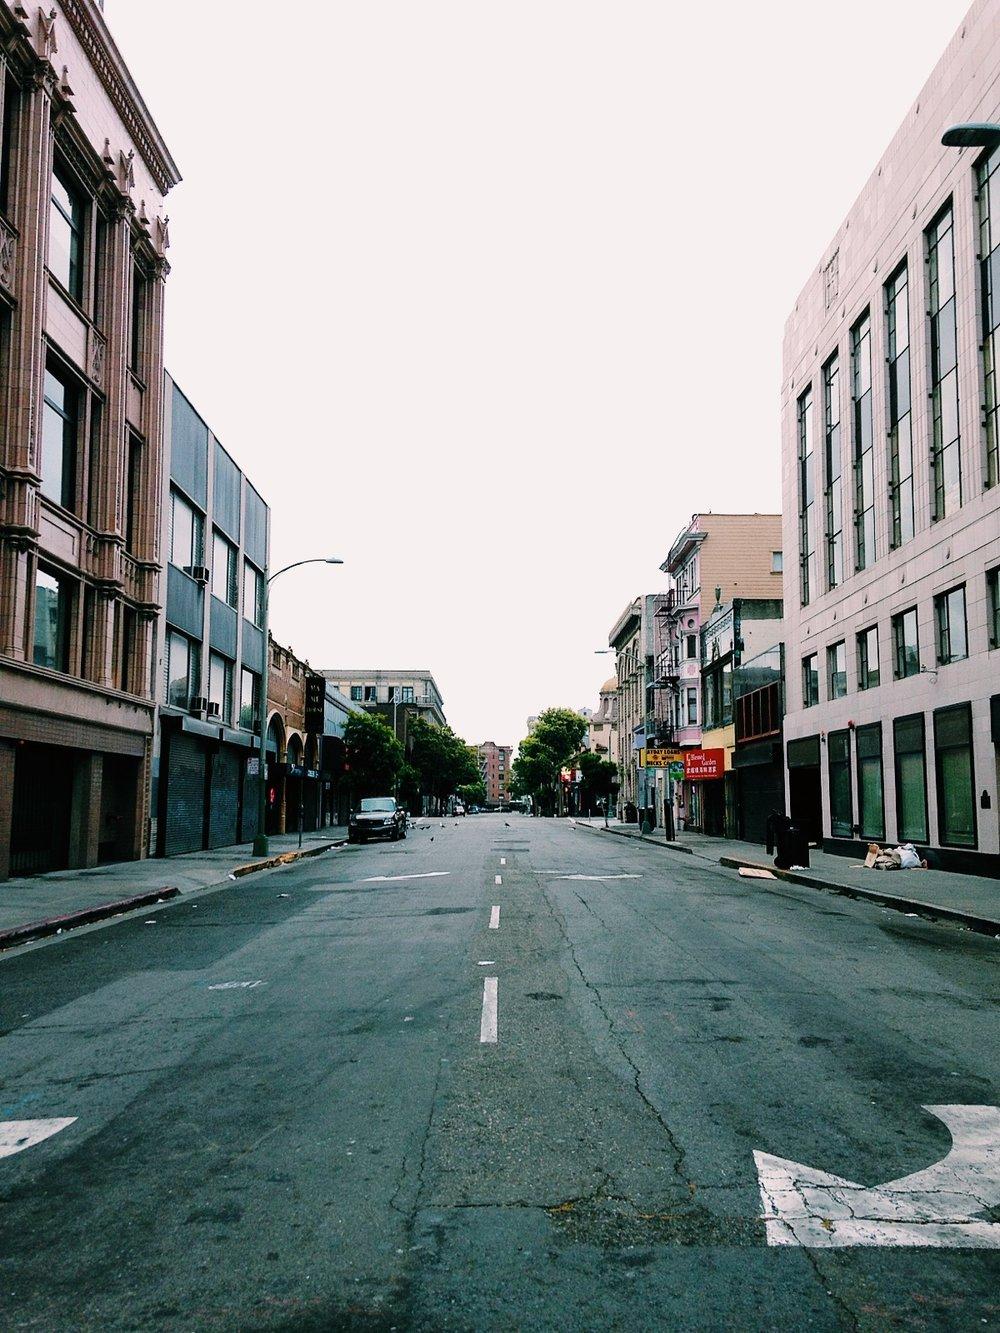 GOFITJO Health and Wellness Blog based in SF — GOFITJO